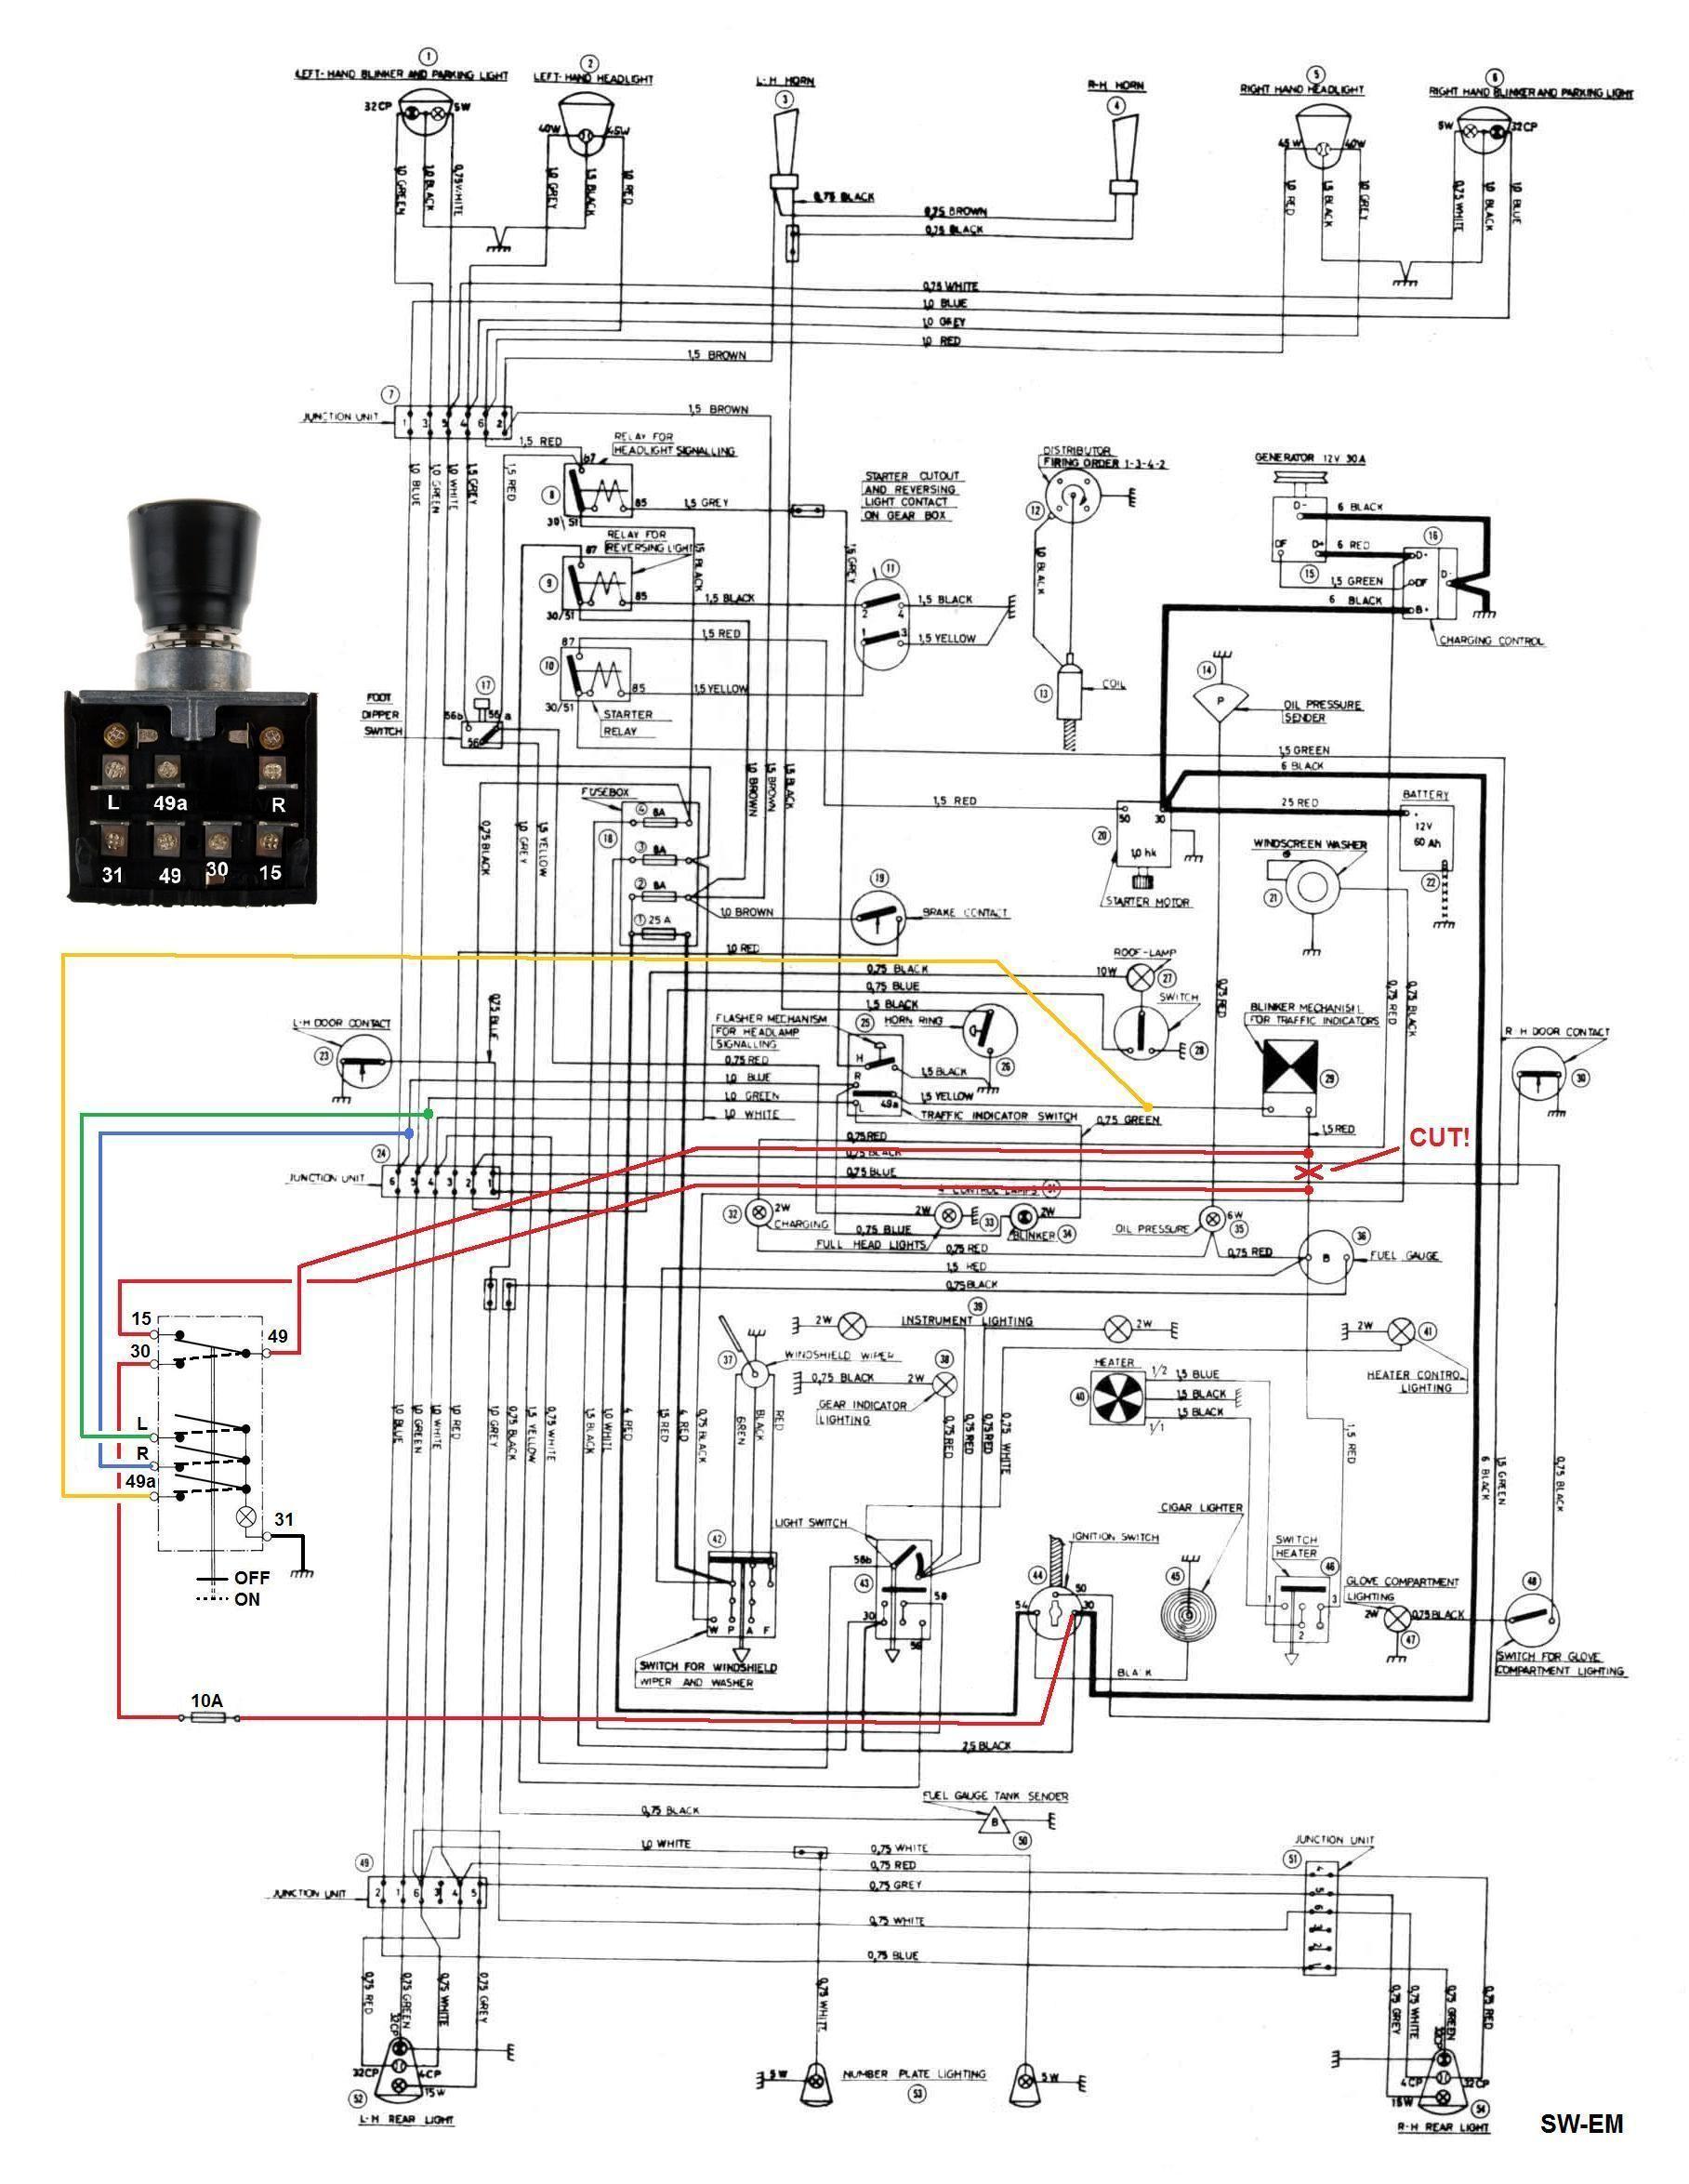 122S Wiring Diagram Nesan E Flasher